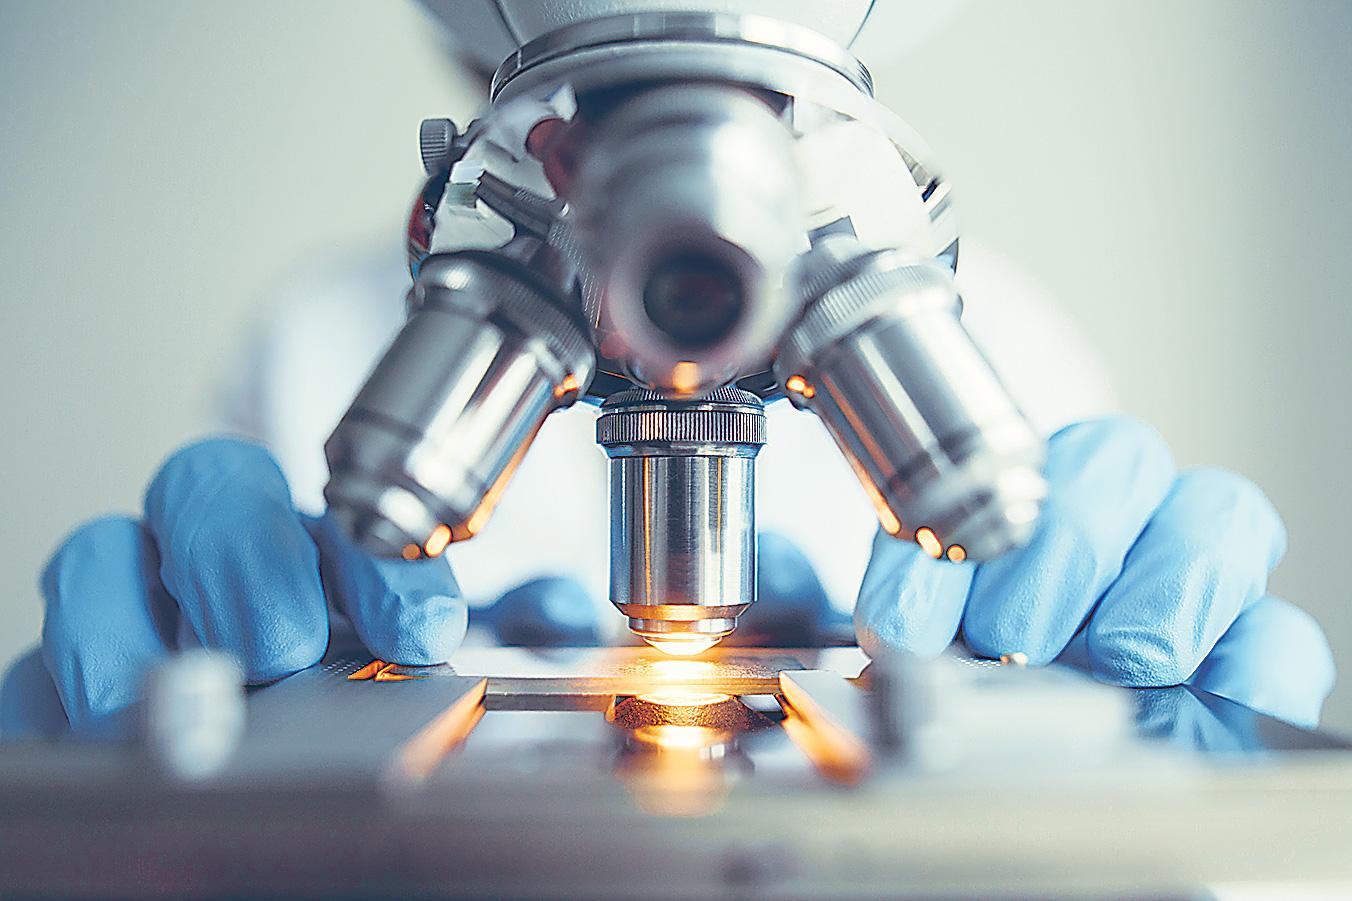 Detailaufnahme: medizinisches Mikroskop